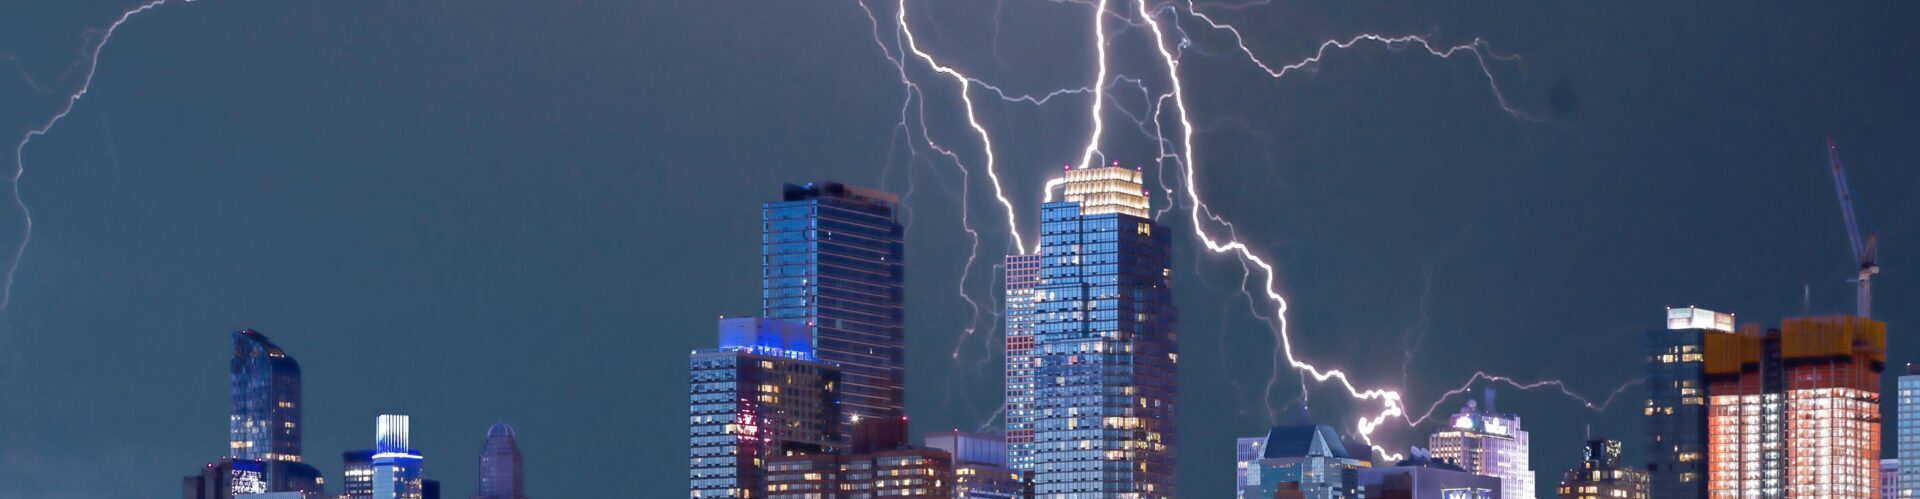 Lightning struck my computer